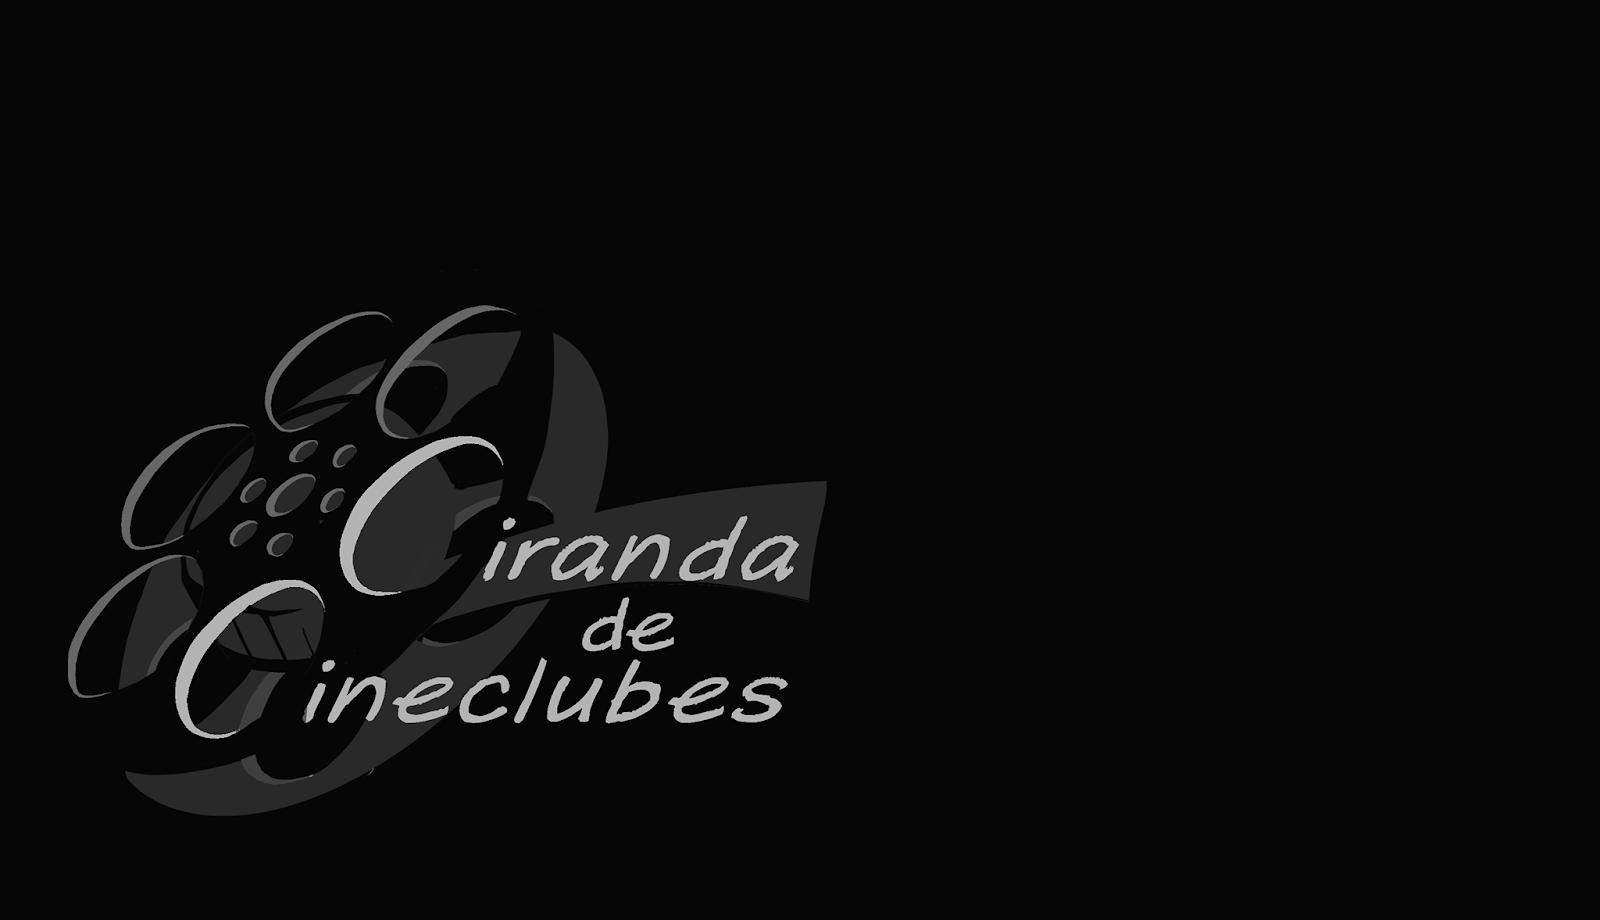 Ciranda de Cineclubes